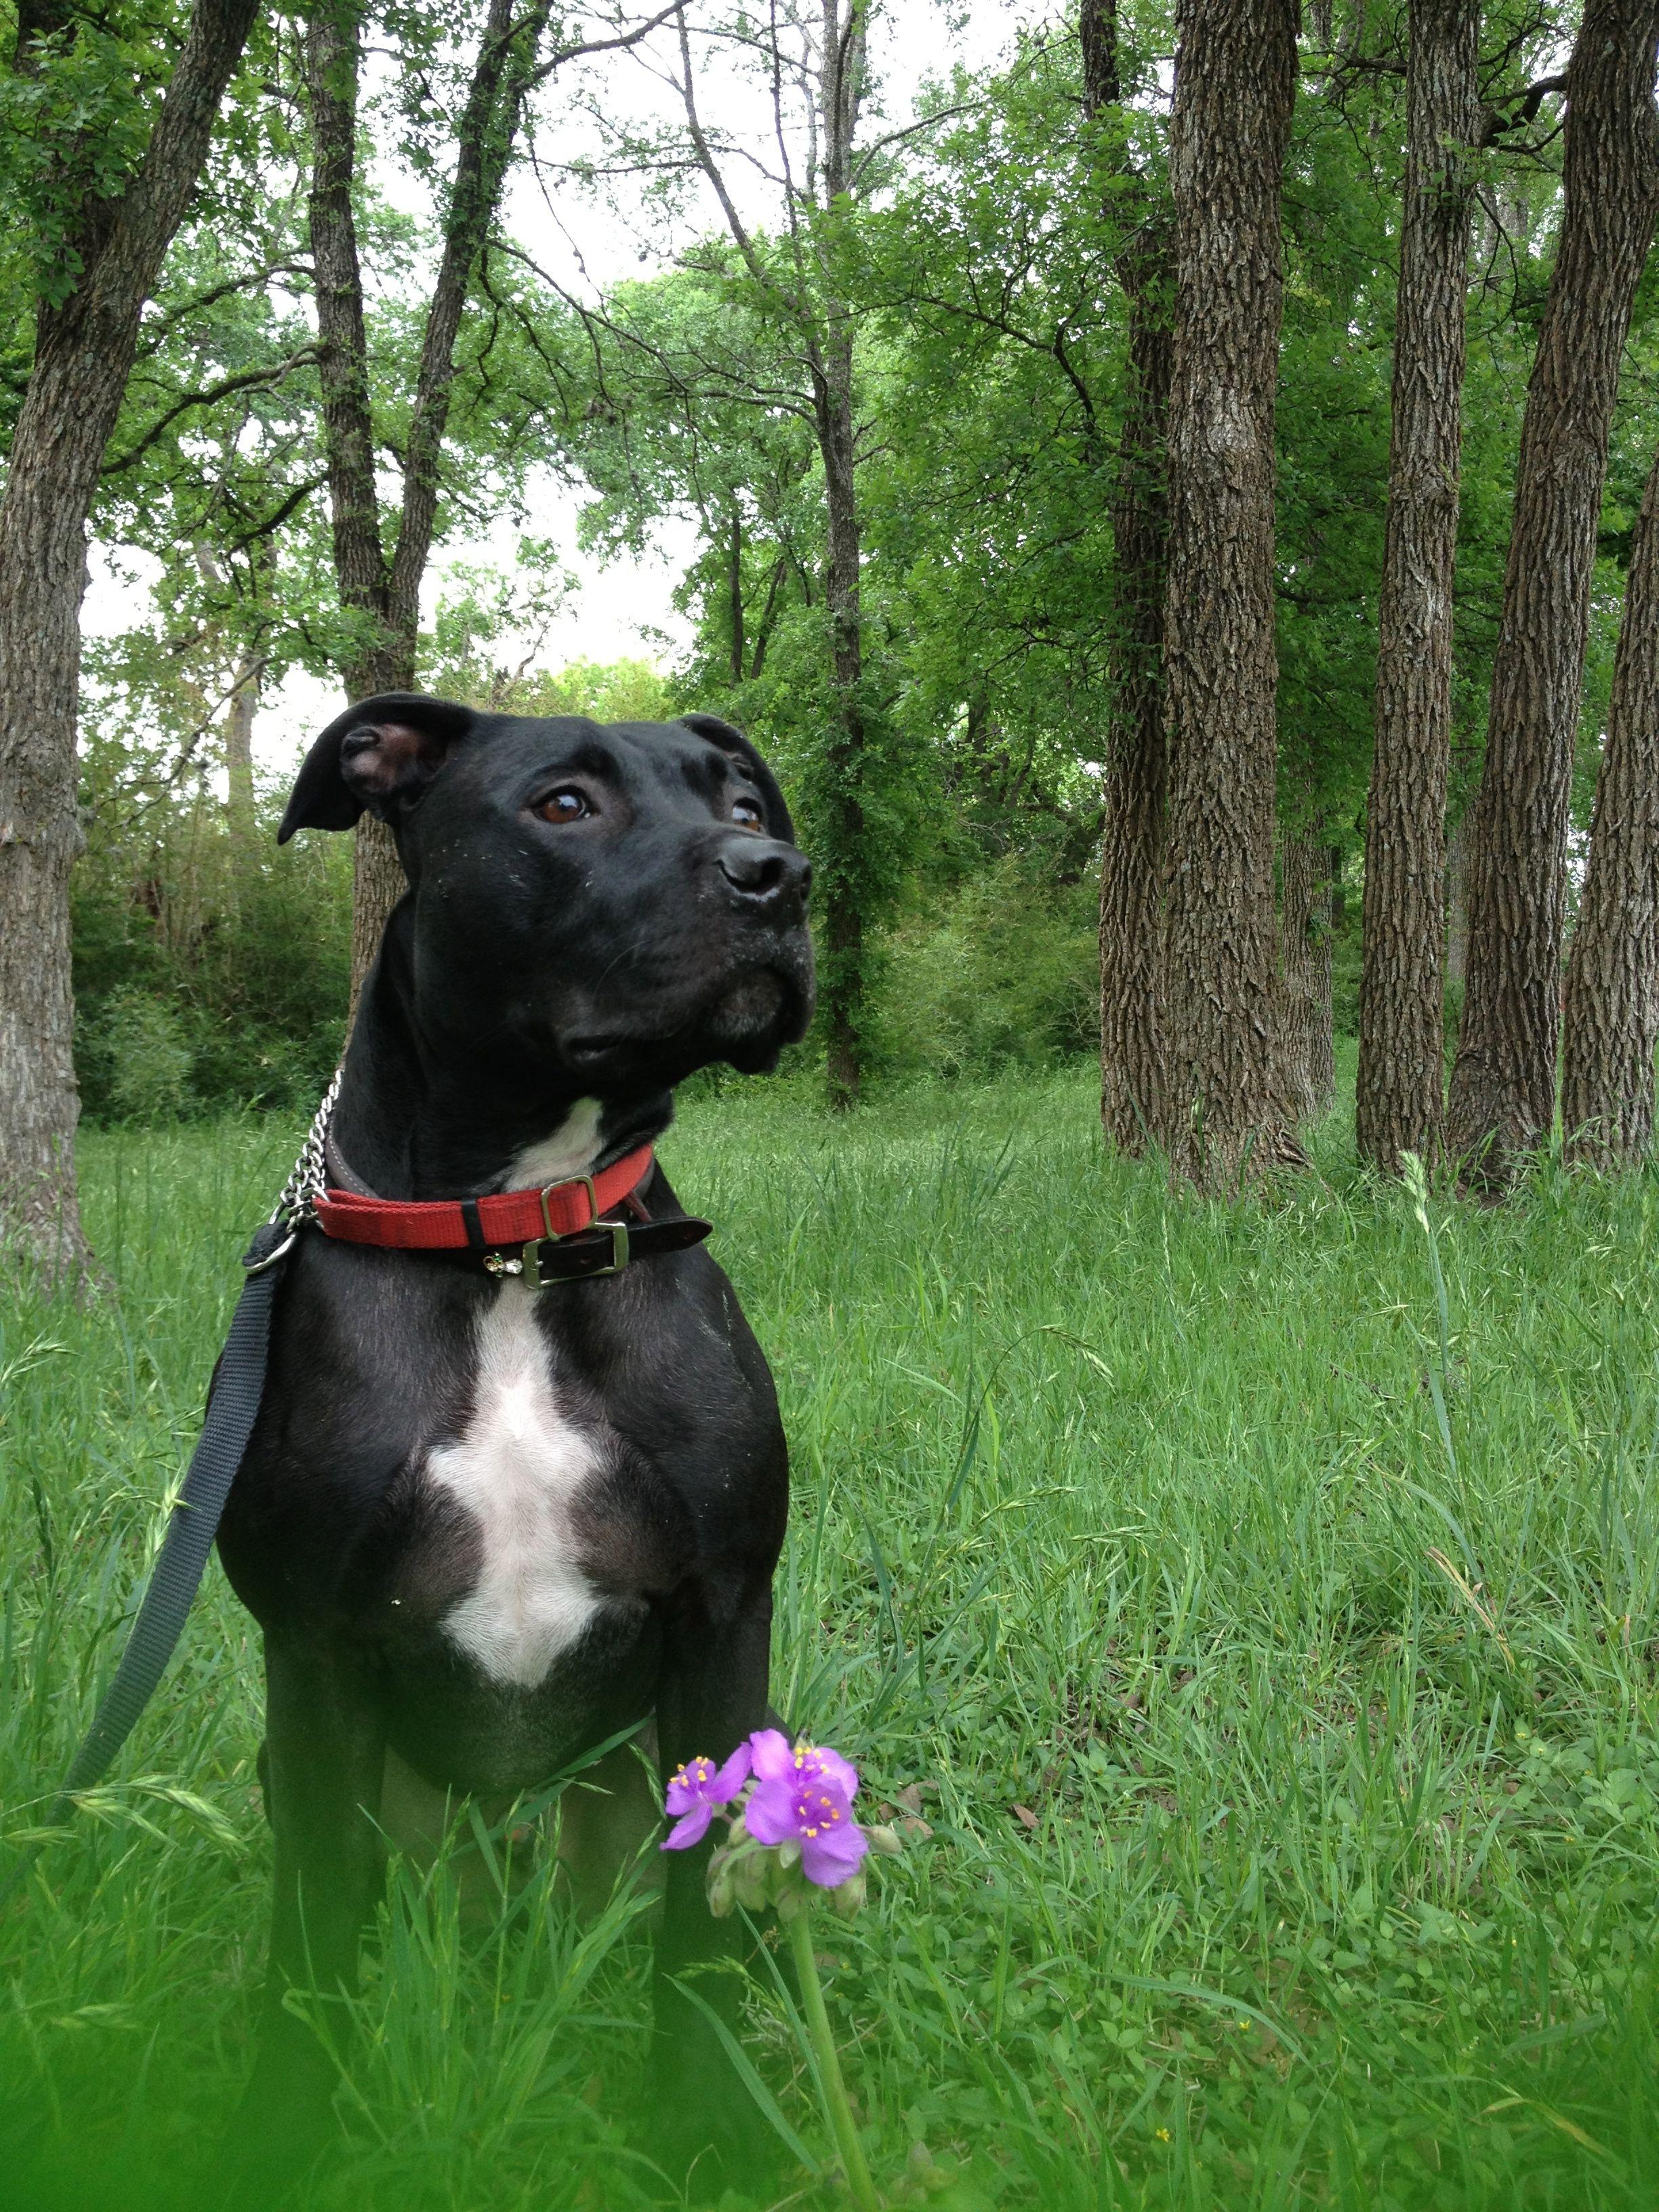 pitbull dogs   black pitbull dog iphone wallpaper   Funny and Cute Black HD Pet Dog ...